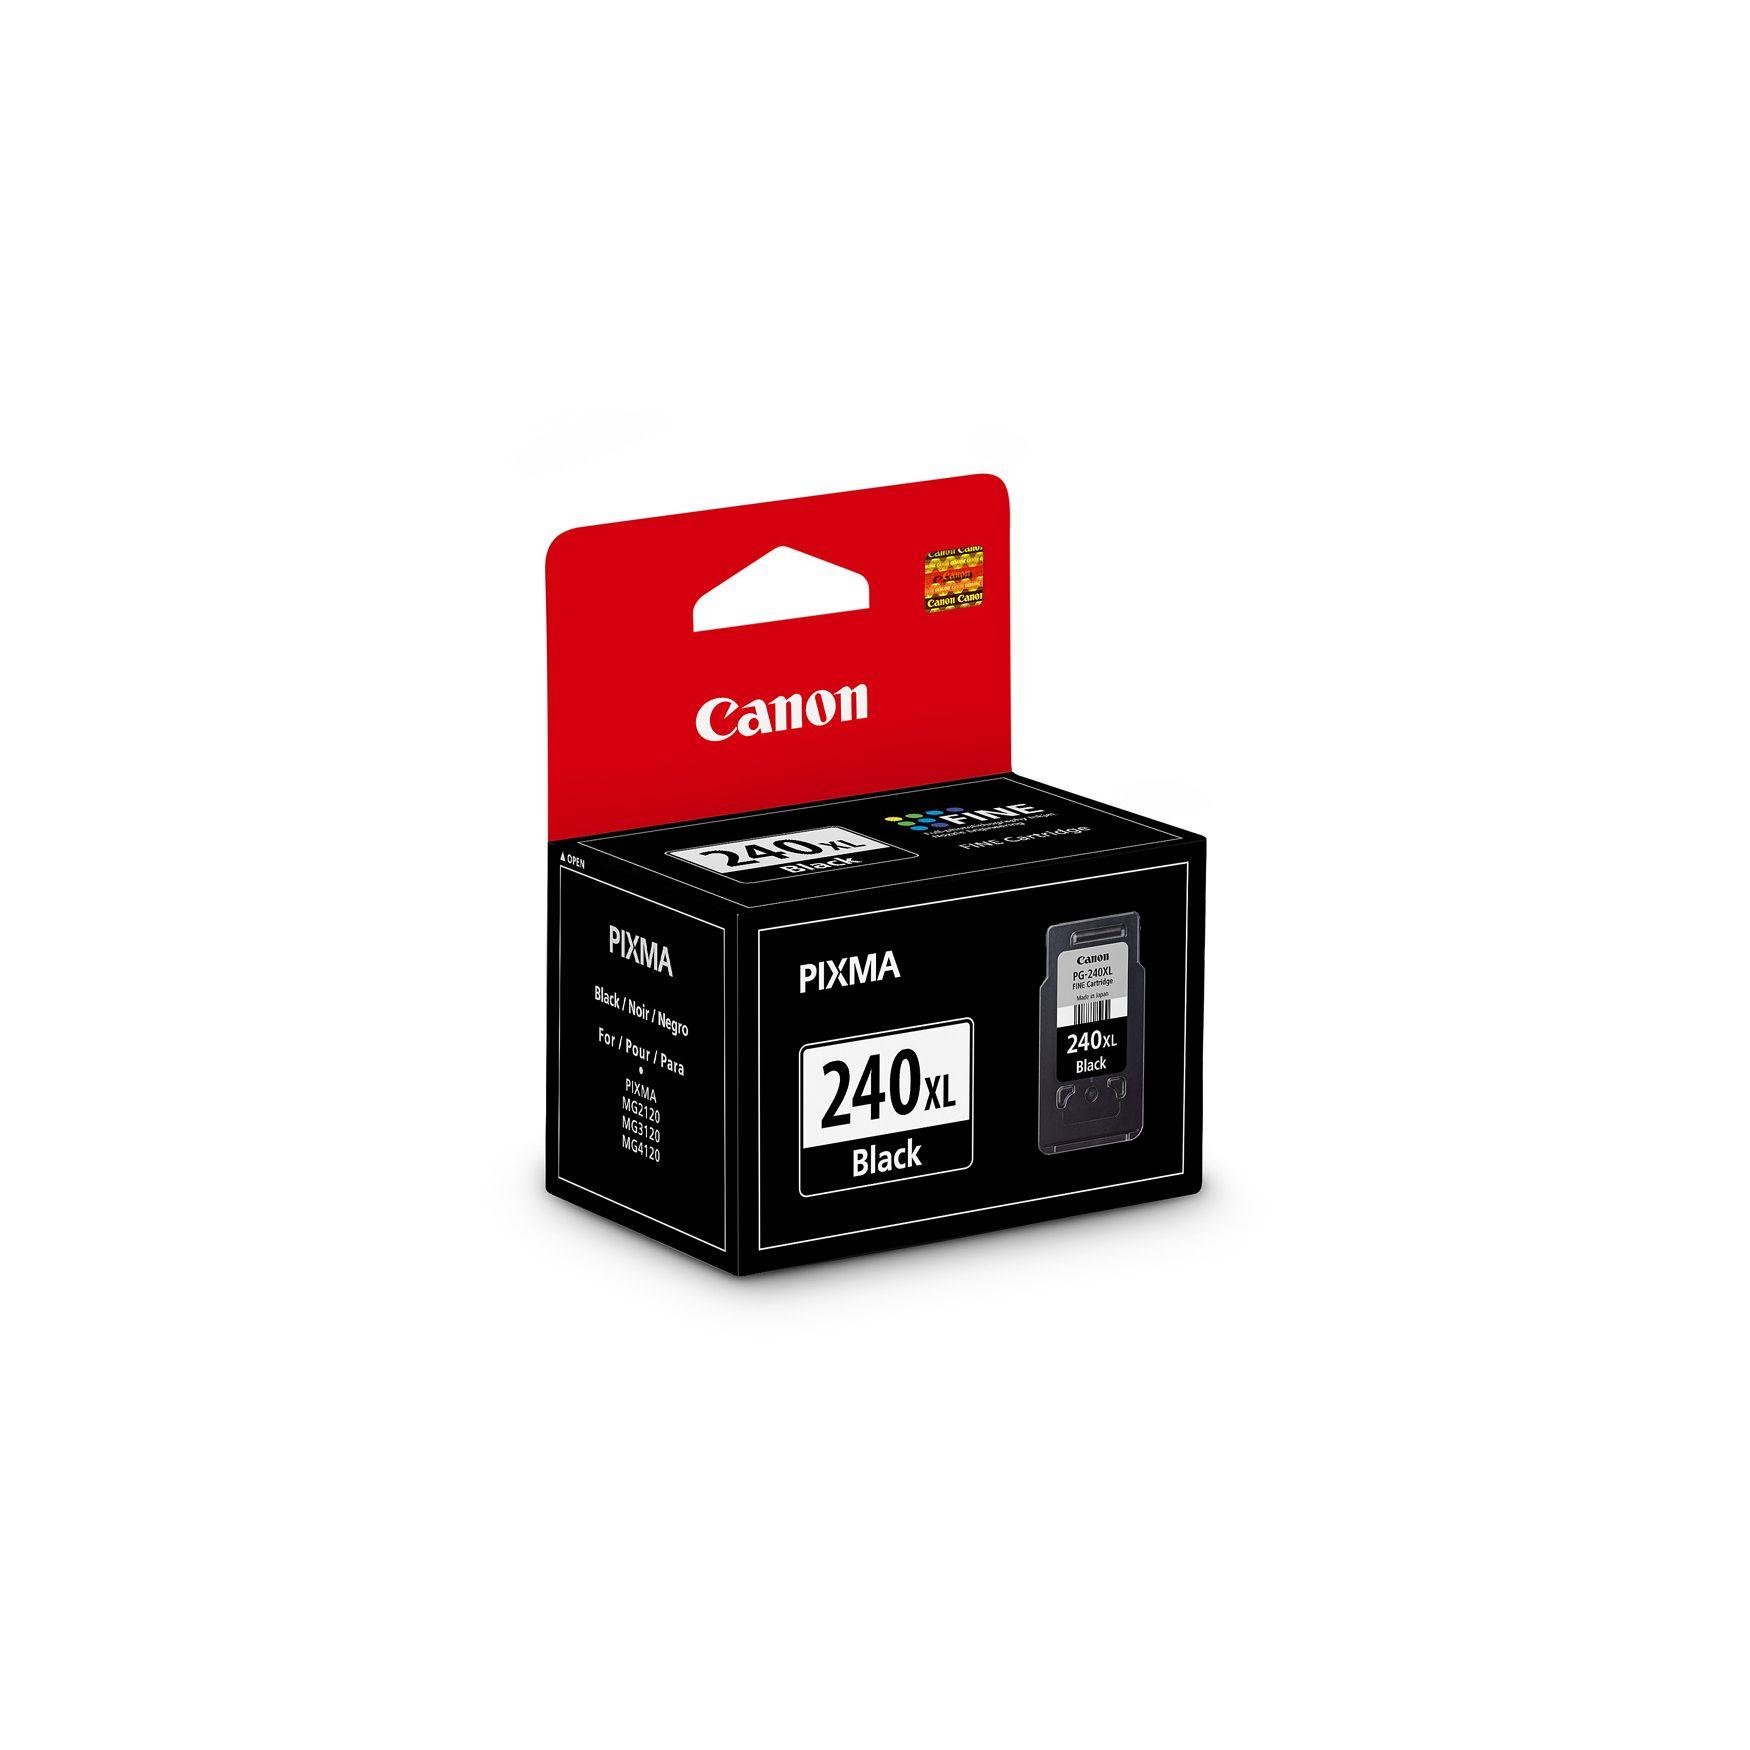 Canon PG-240XL FINE Ink Black Cartridge